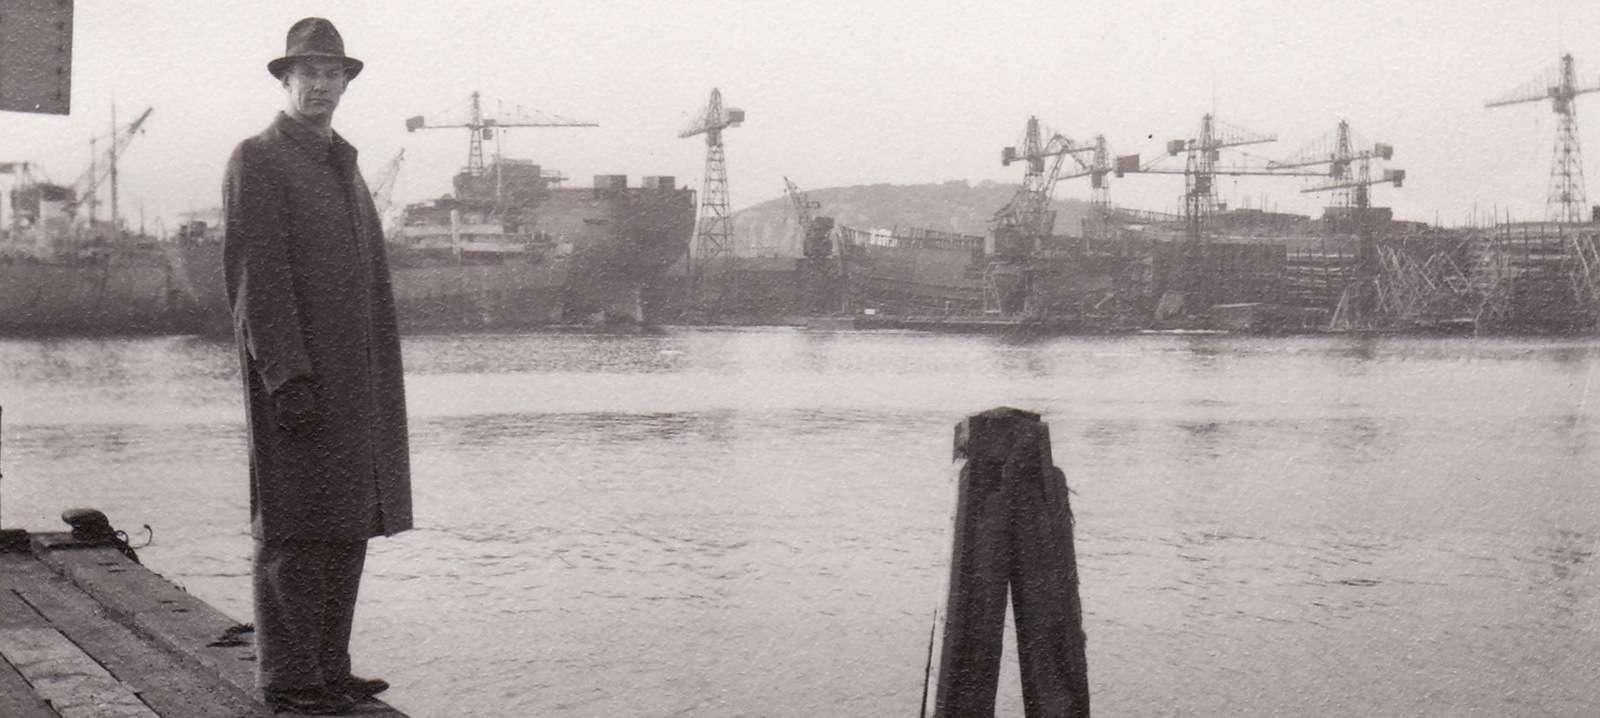 Göteborg satama 1947